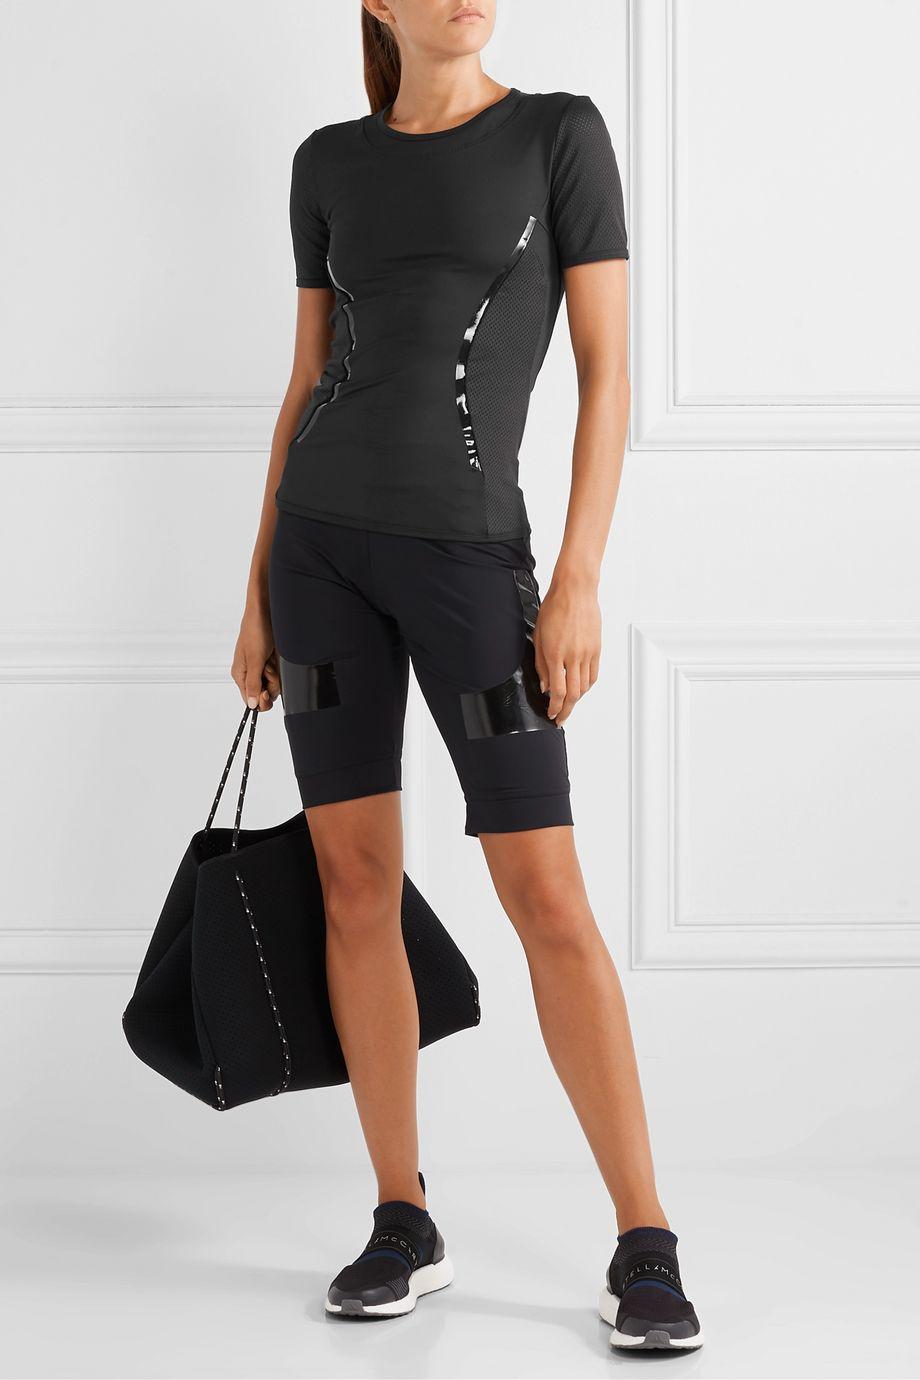 adidas by Stella McCartney Essentials mesh-paneled Climalite T-shirt